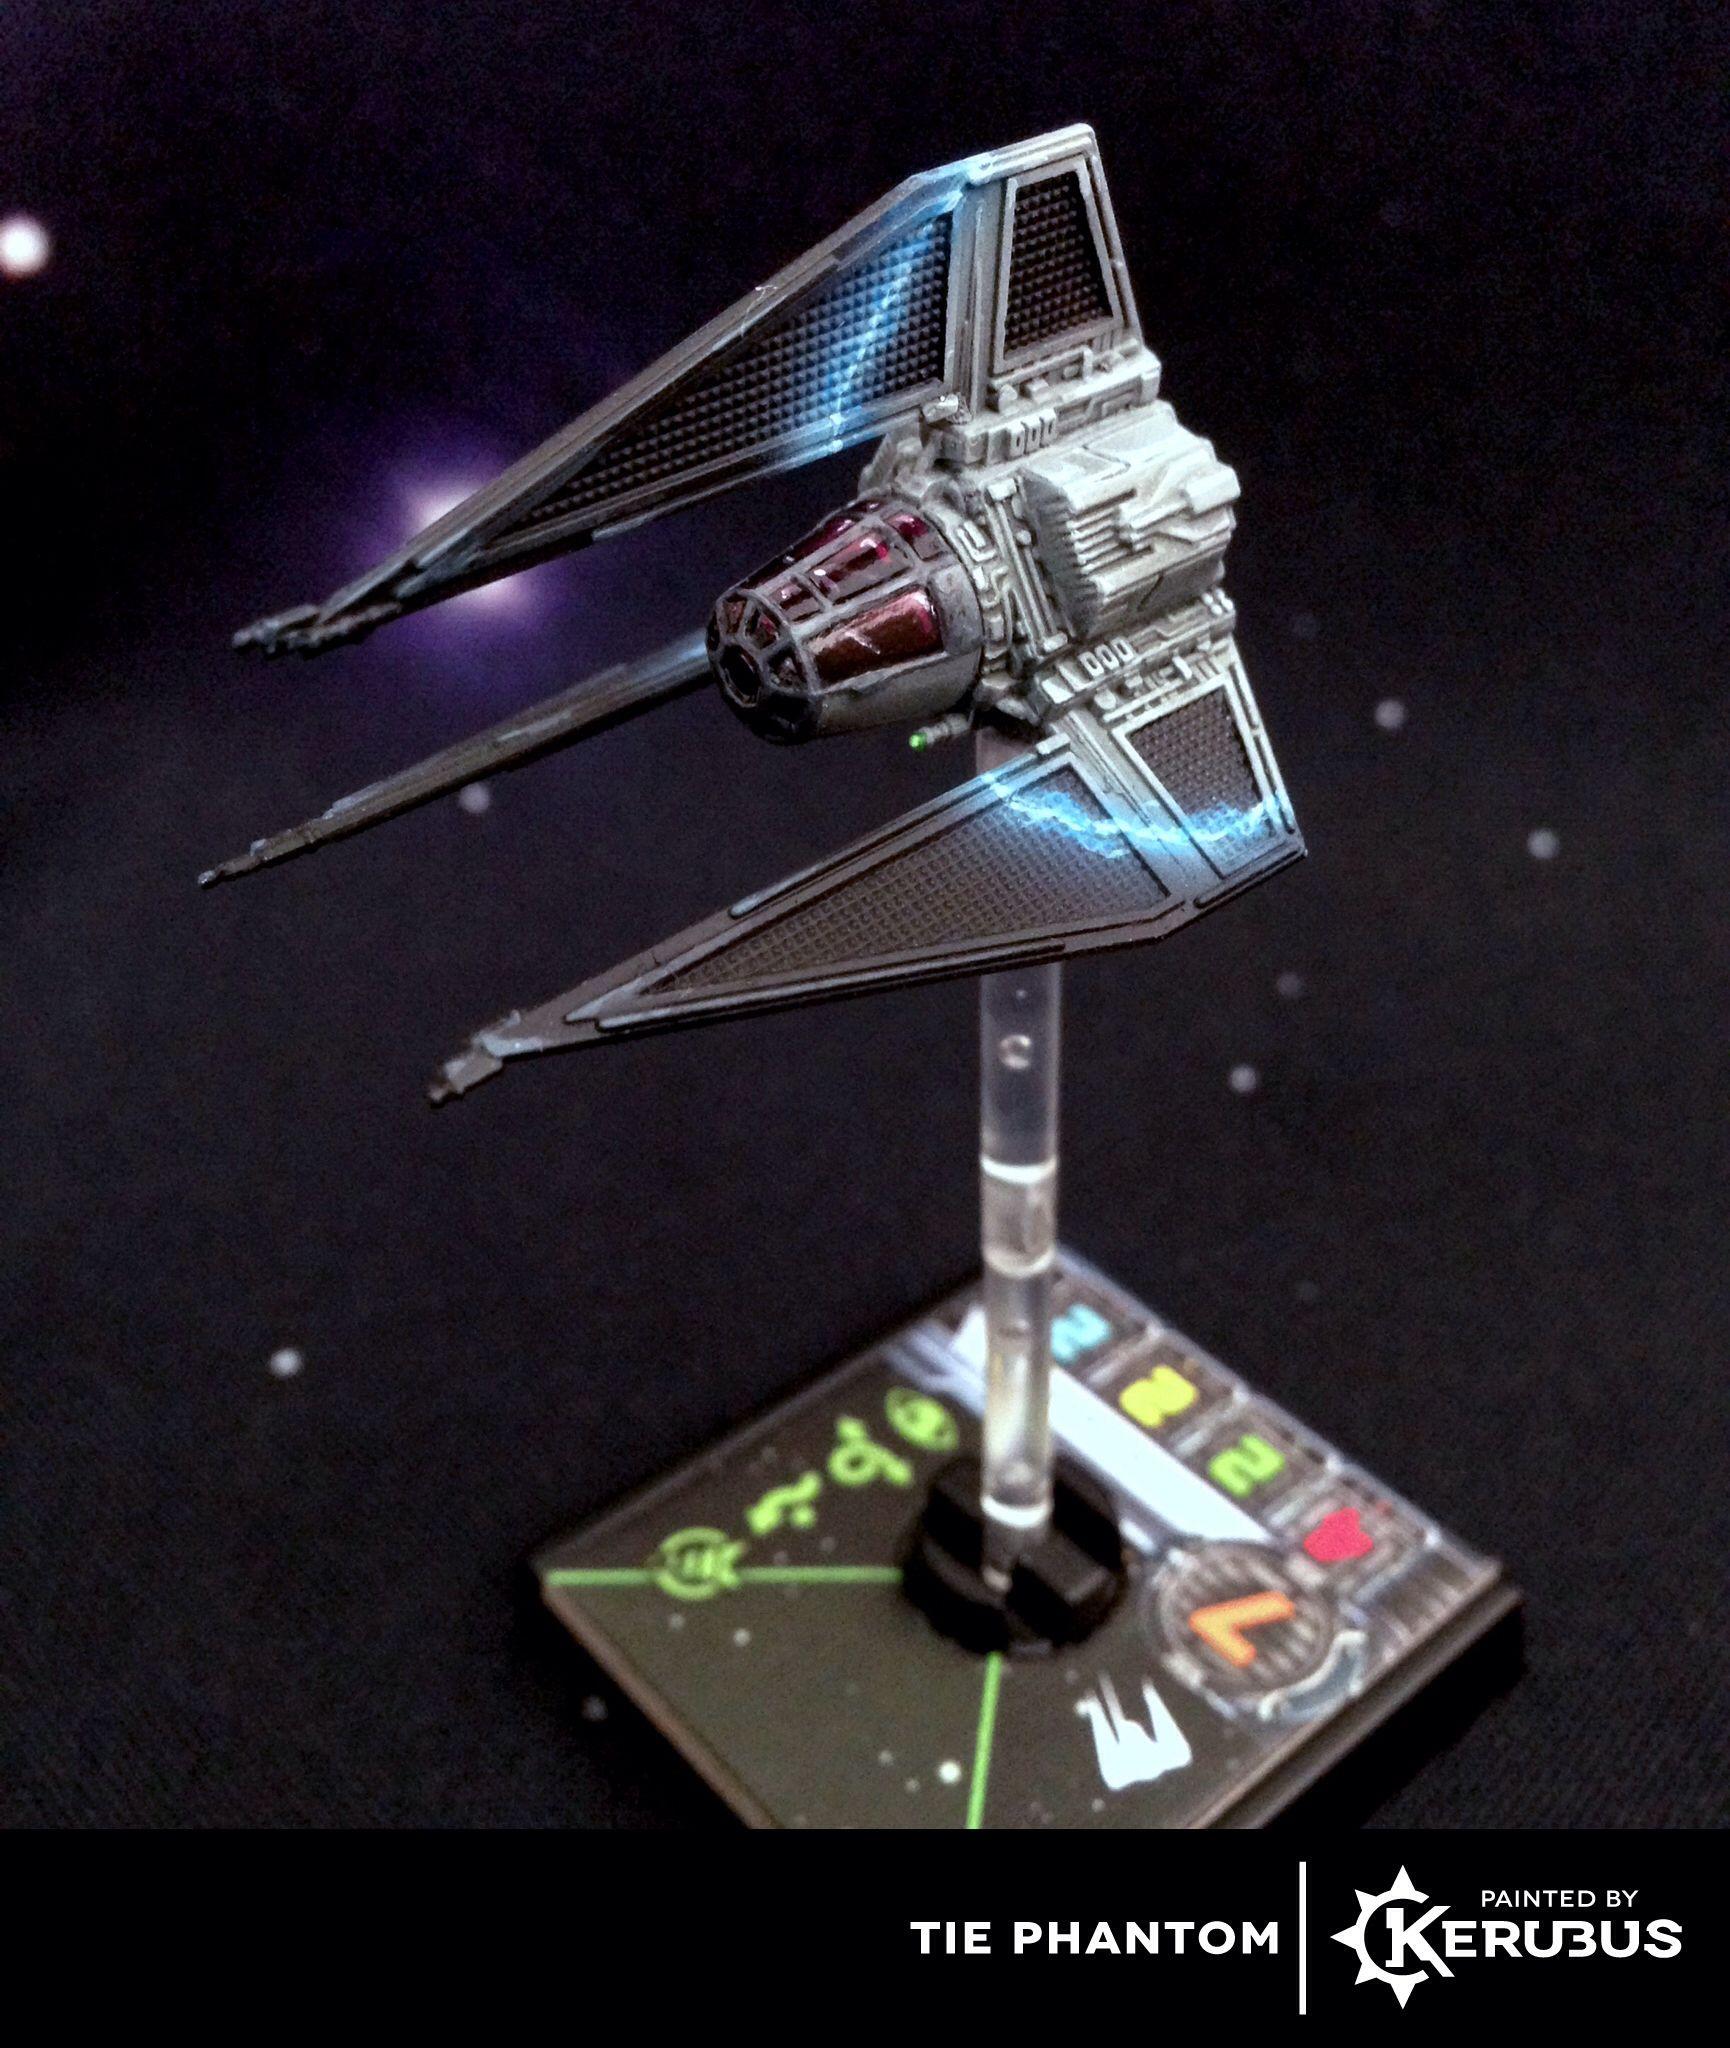 Tie Phantom X Wing Miniatures Star Wars Spaceships Star Wars Ships Design